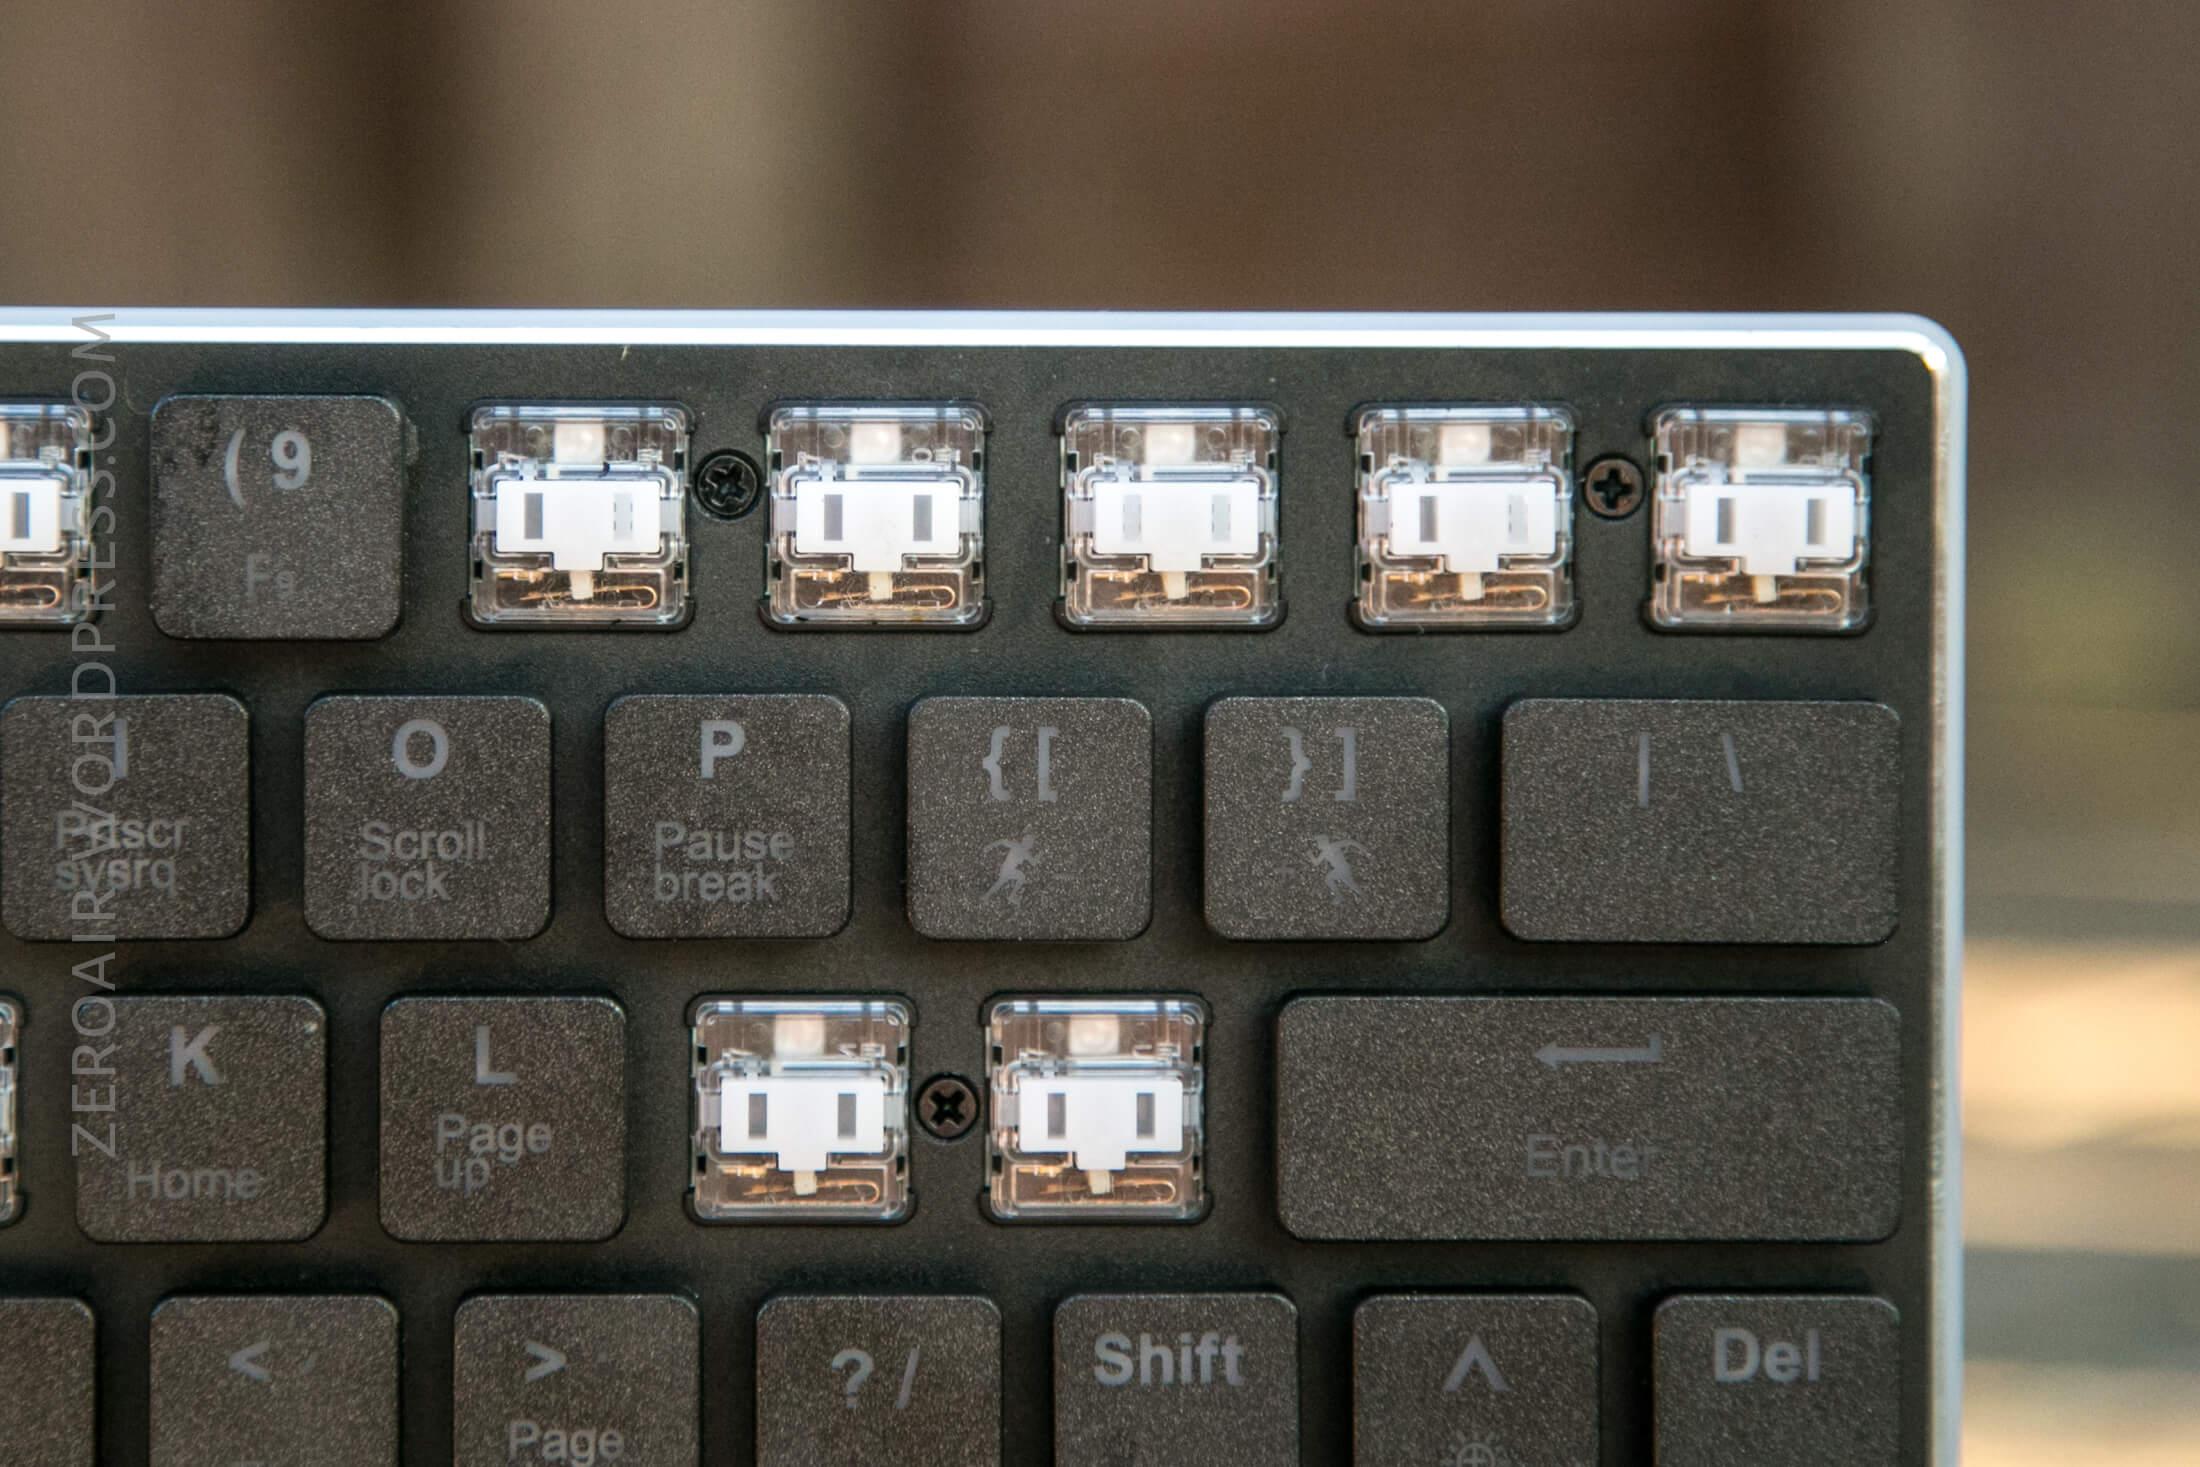 14_zeroair_reviews_anidees_prismatic_mechanical_keyboard.jpg